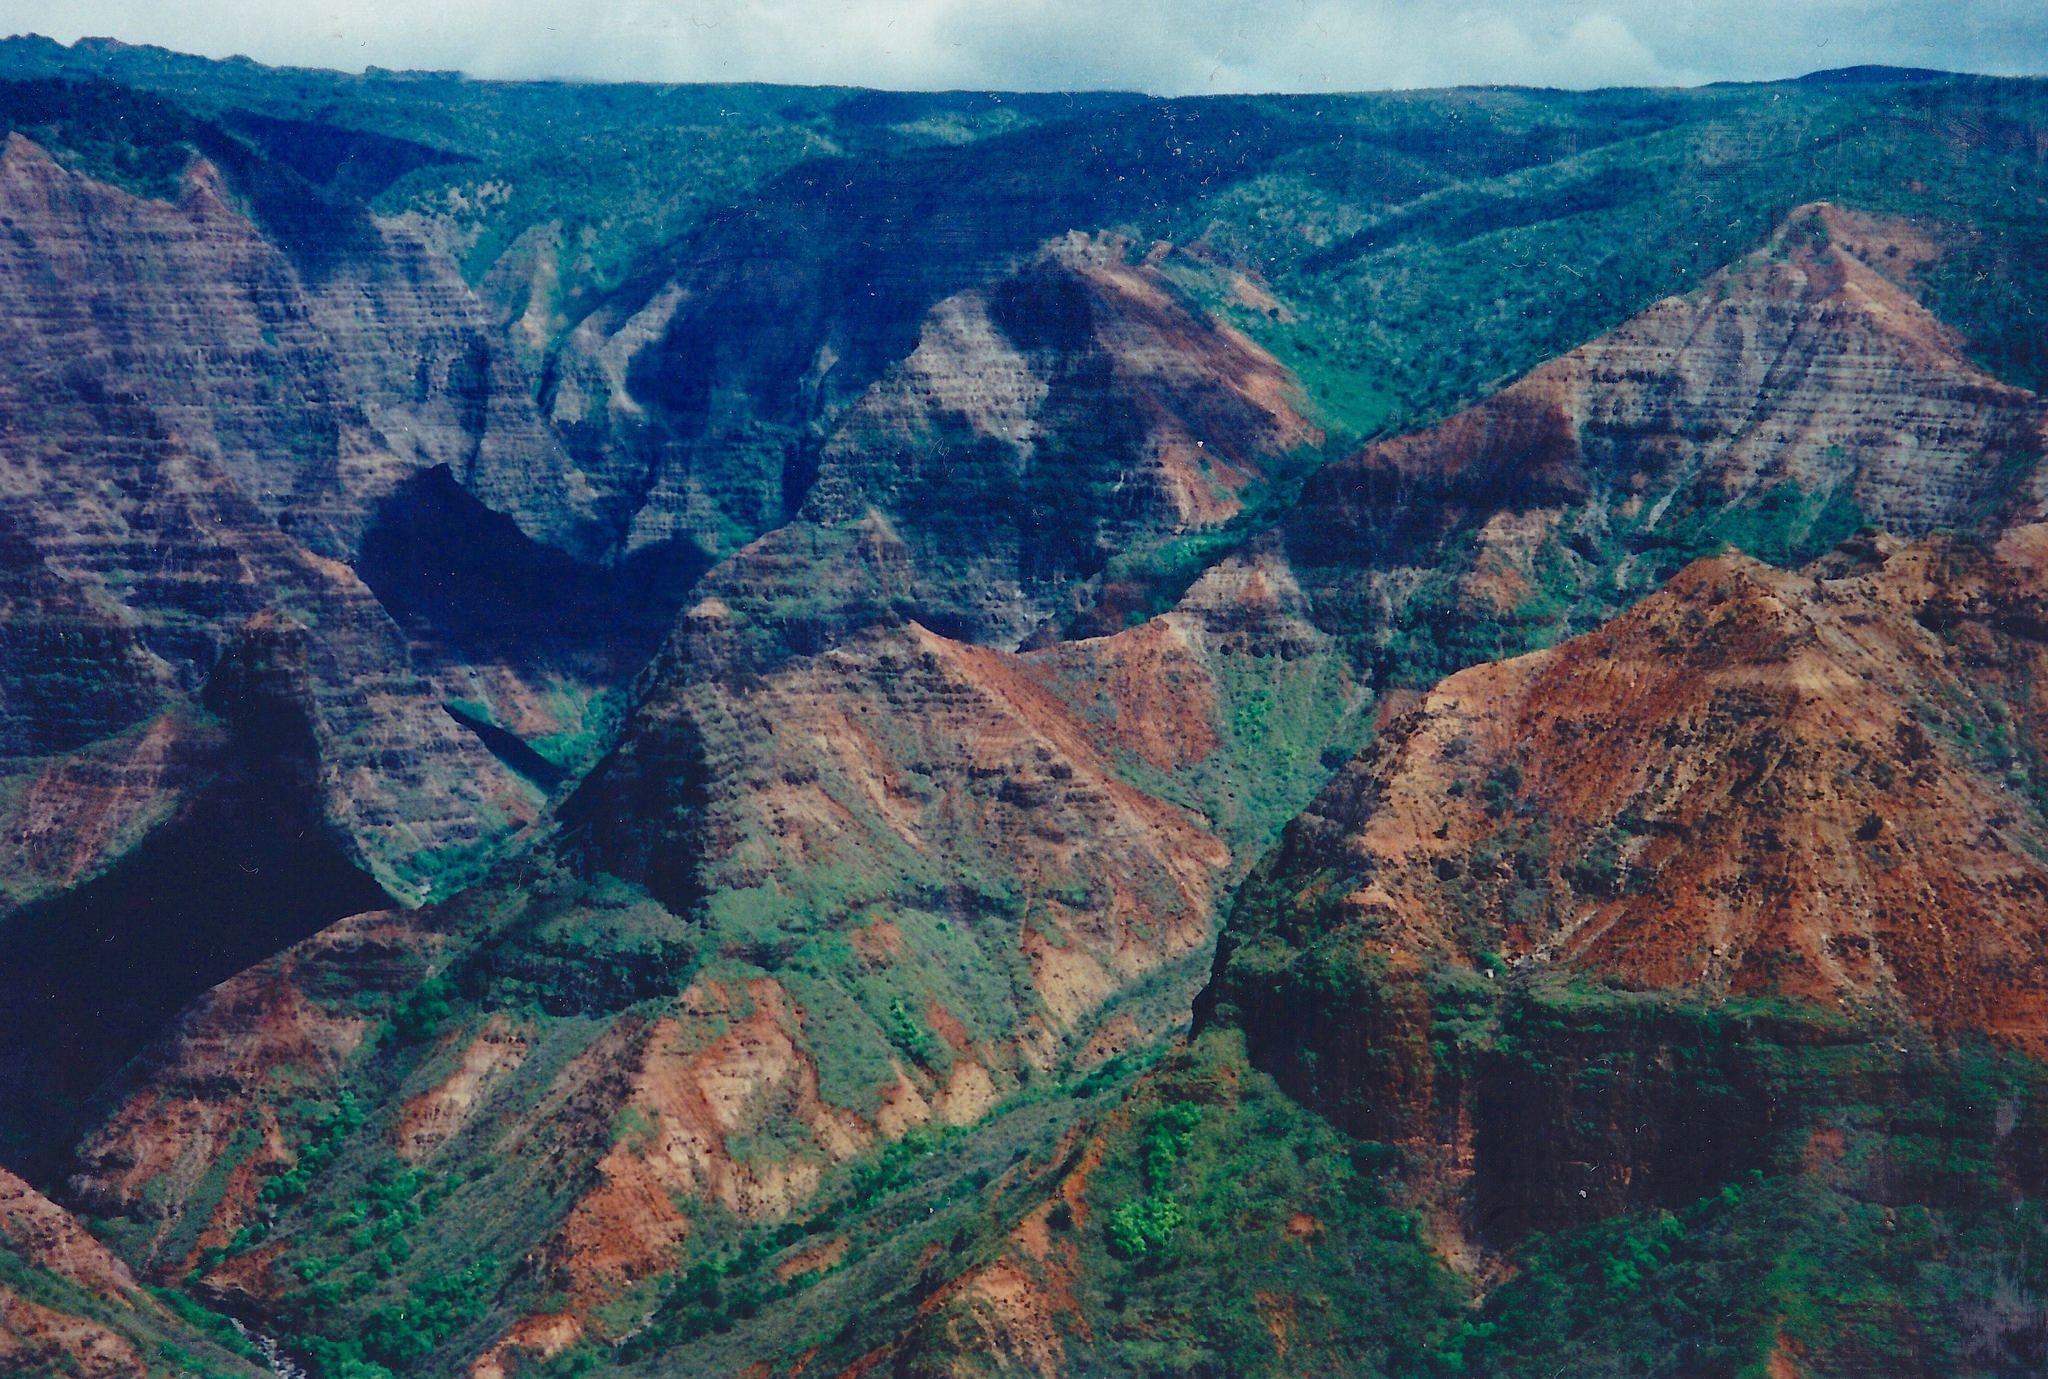 https://flic.kr/p/sUhTay | Waimea Canyon, Kauai Hawaii